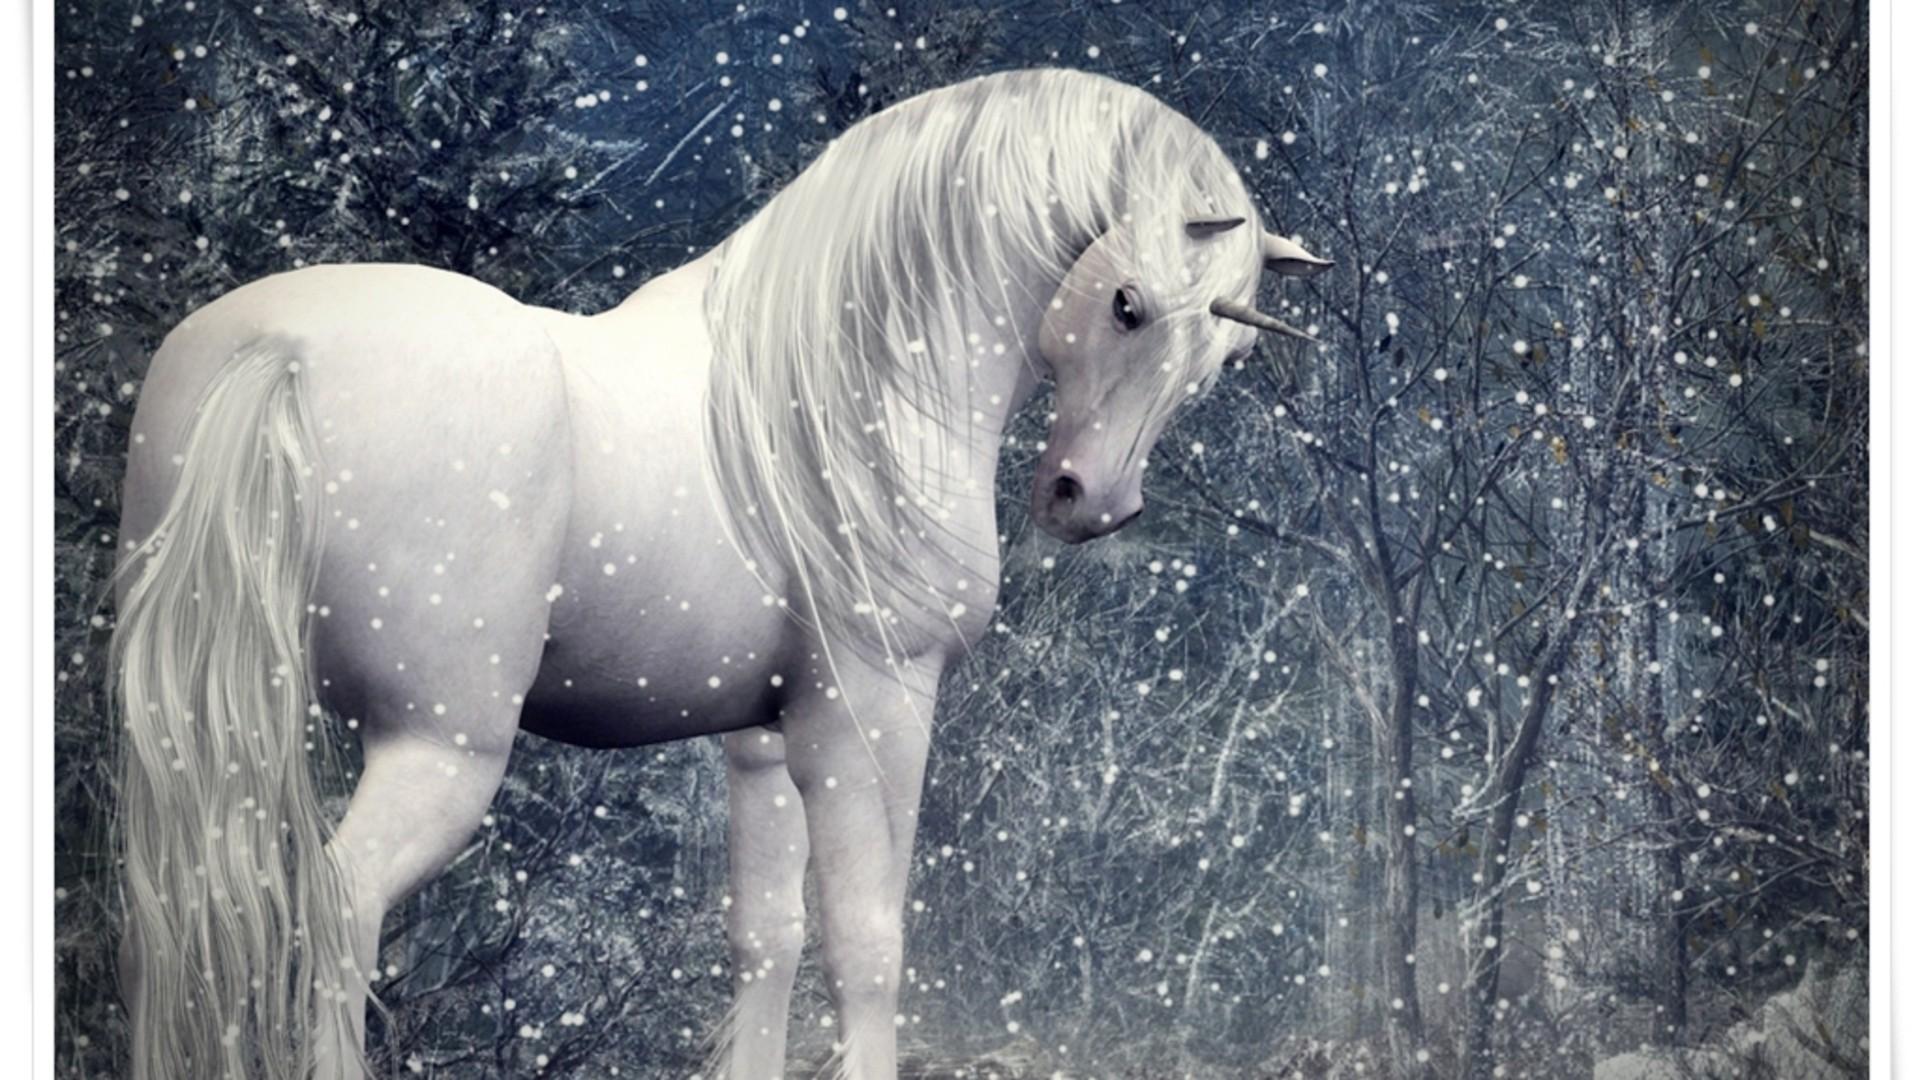 Unicorn pictures 40 high quality unicorn wallpapers full hd unicorn - Unicorn Pictures 40 High Quality Unicorn Wallpapers Full Hd Unicorn 28